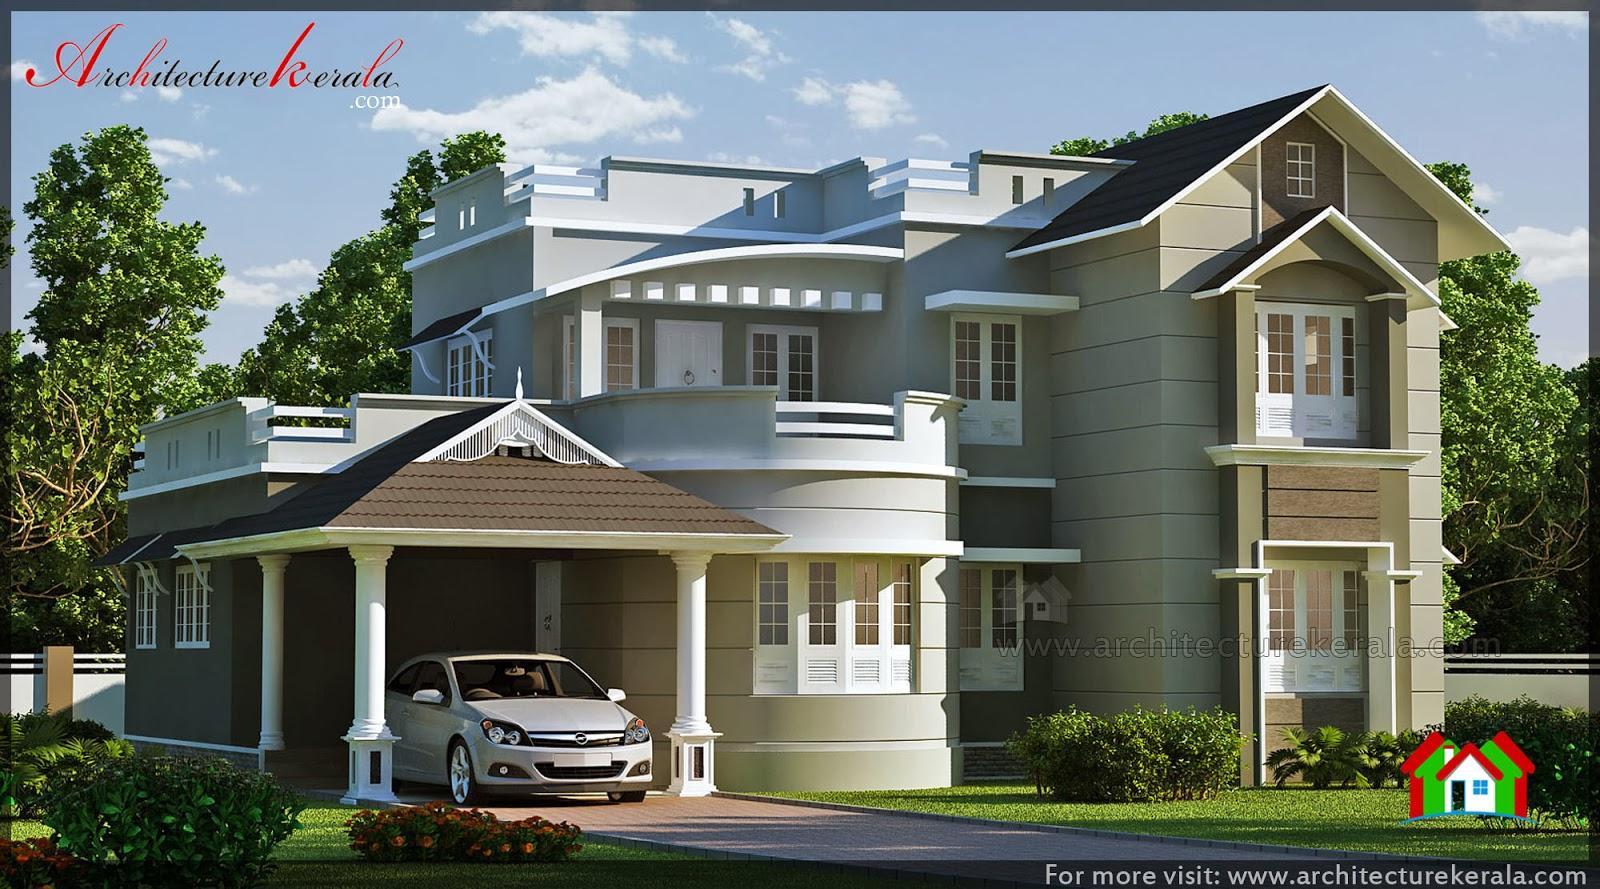 good looking house design architecture kerala. Black Bedroom Furniture Sets. Home Design Ideas